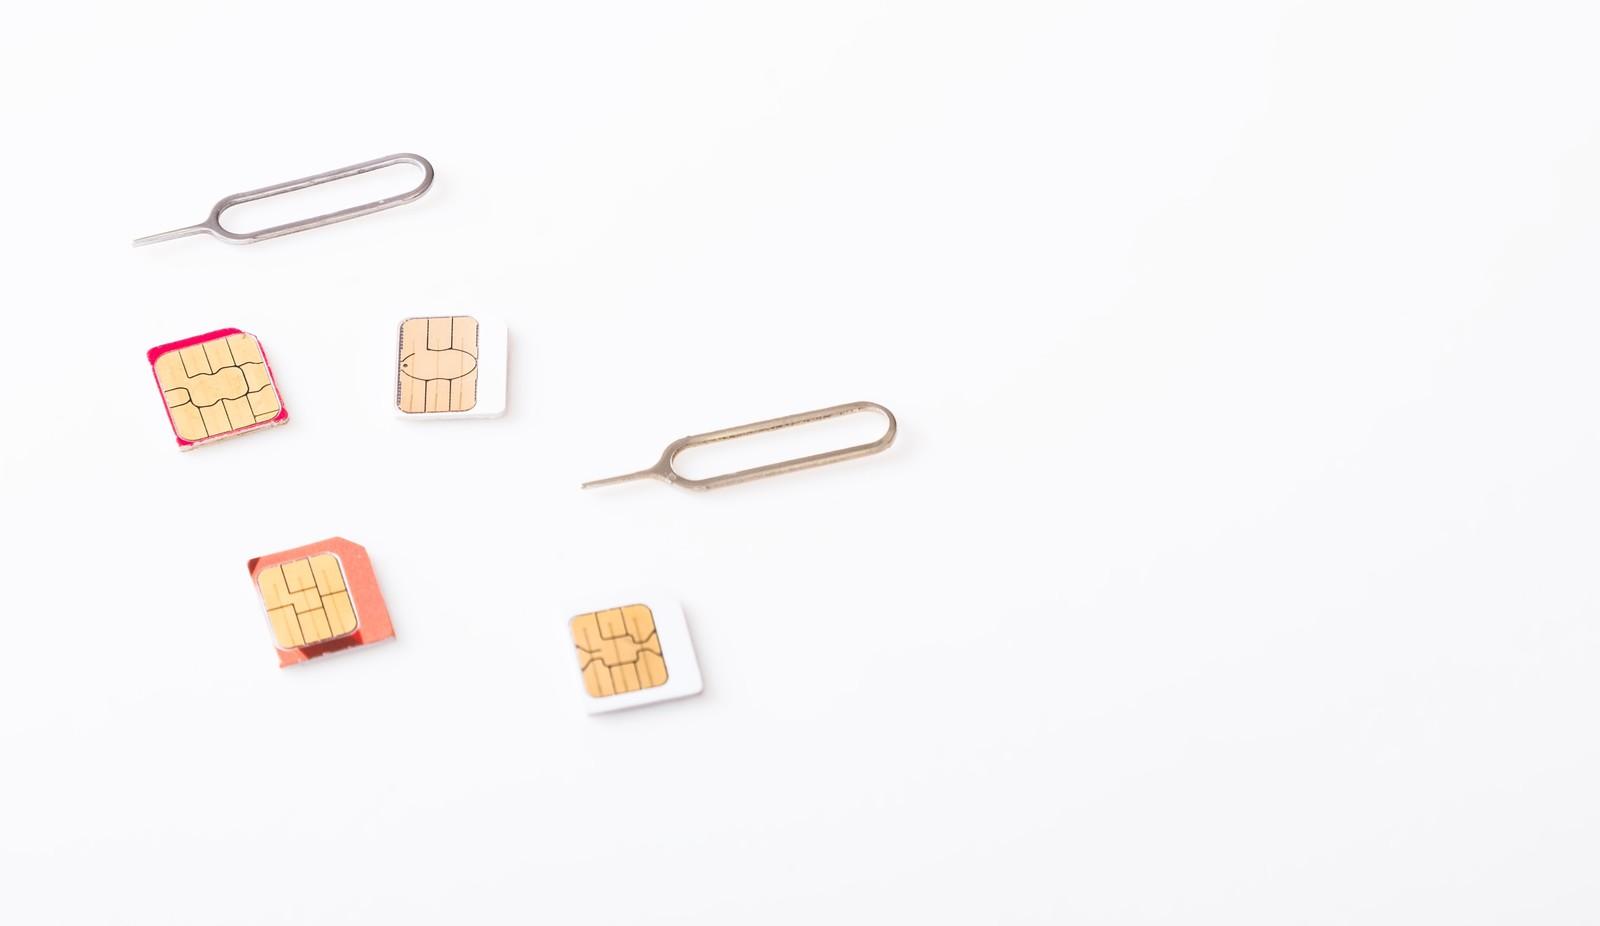 SIMカードとインジェクトピン